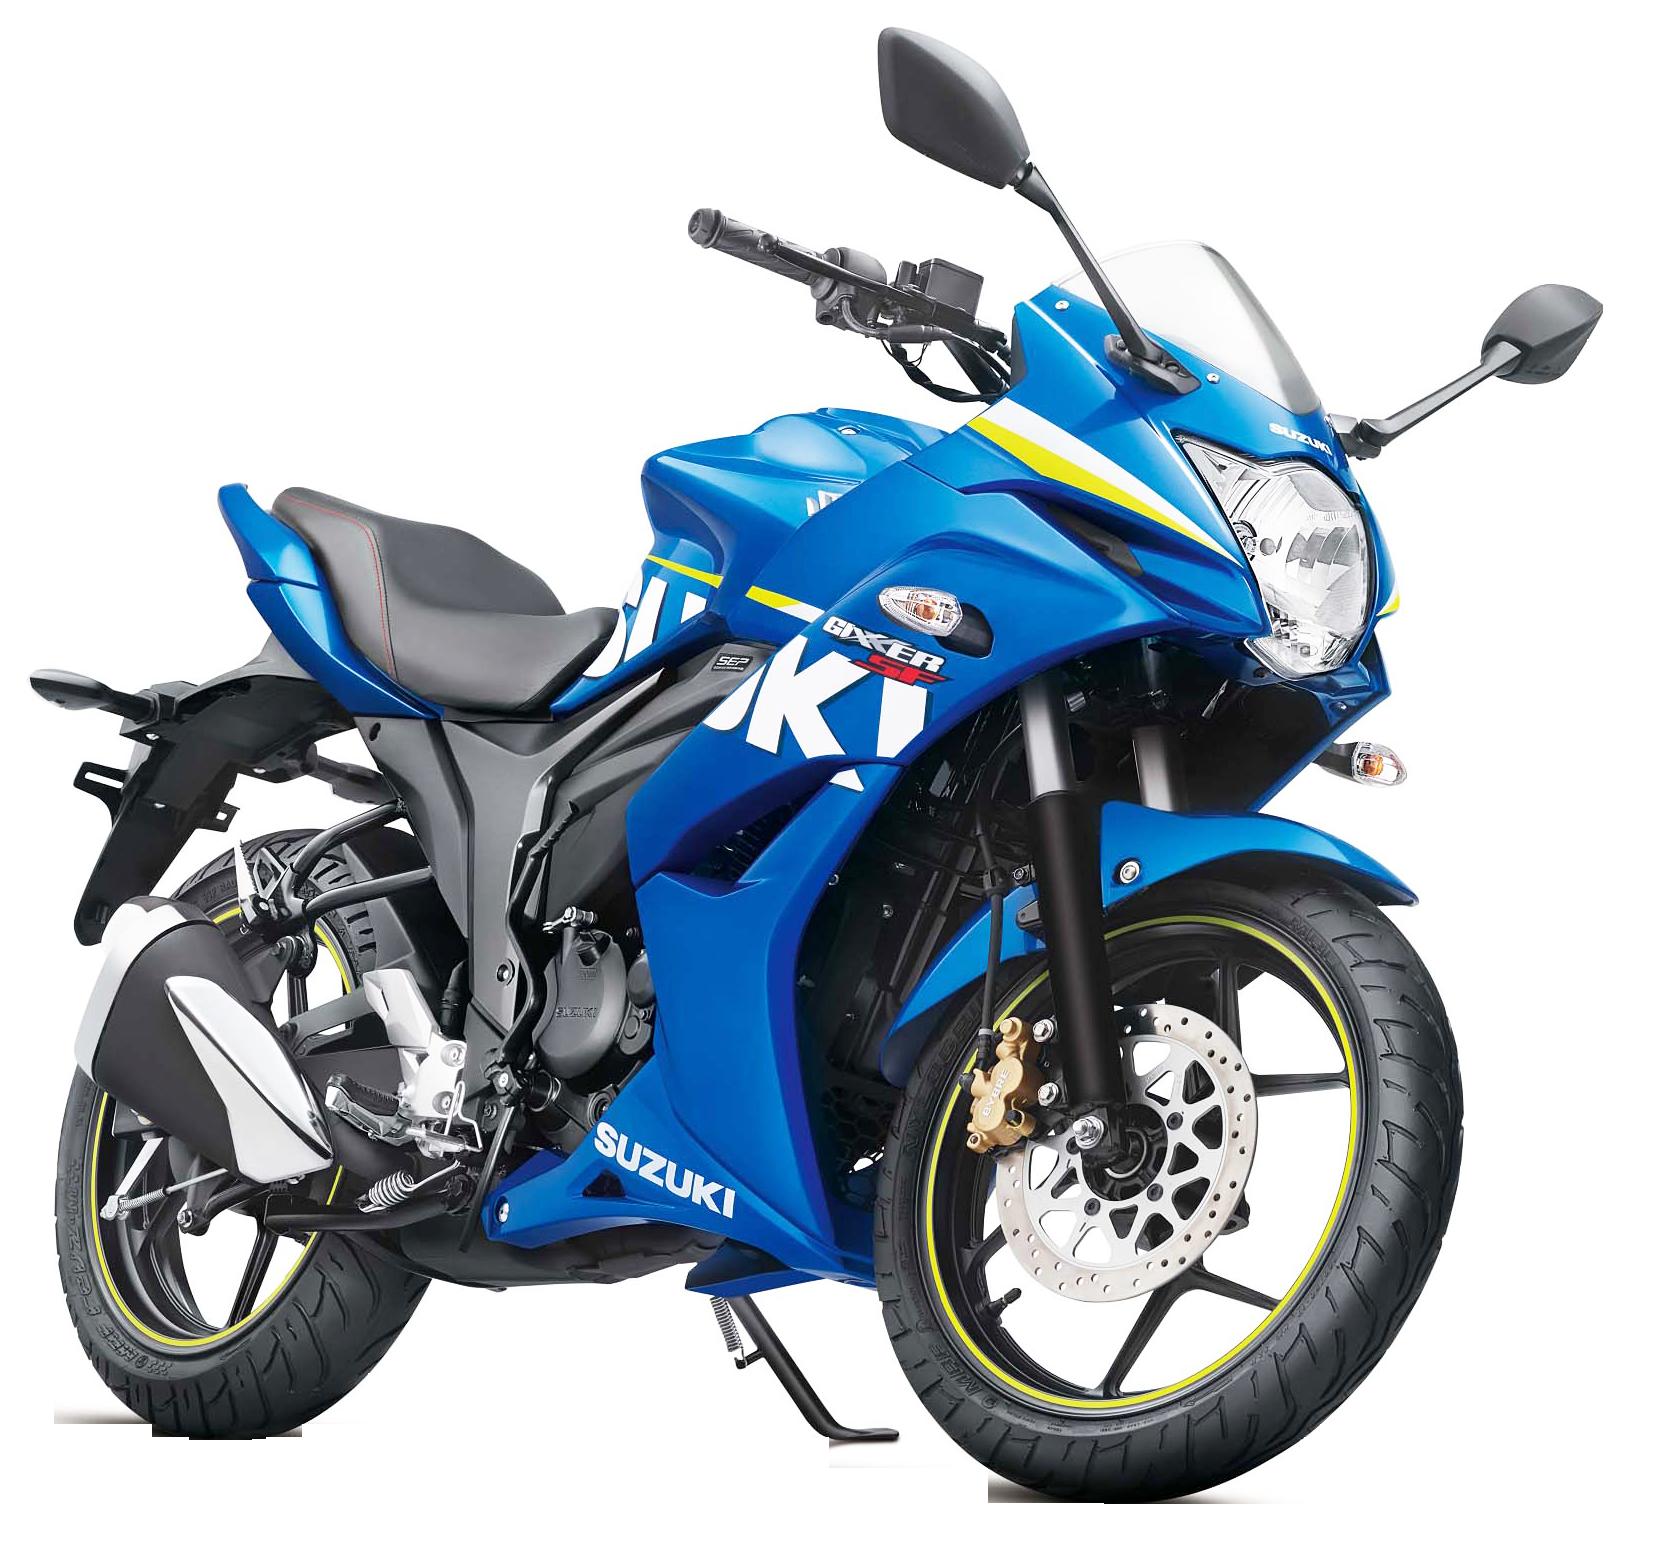 Motorcycle clipart motor bicycle. Suzuki gixxer sf bike